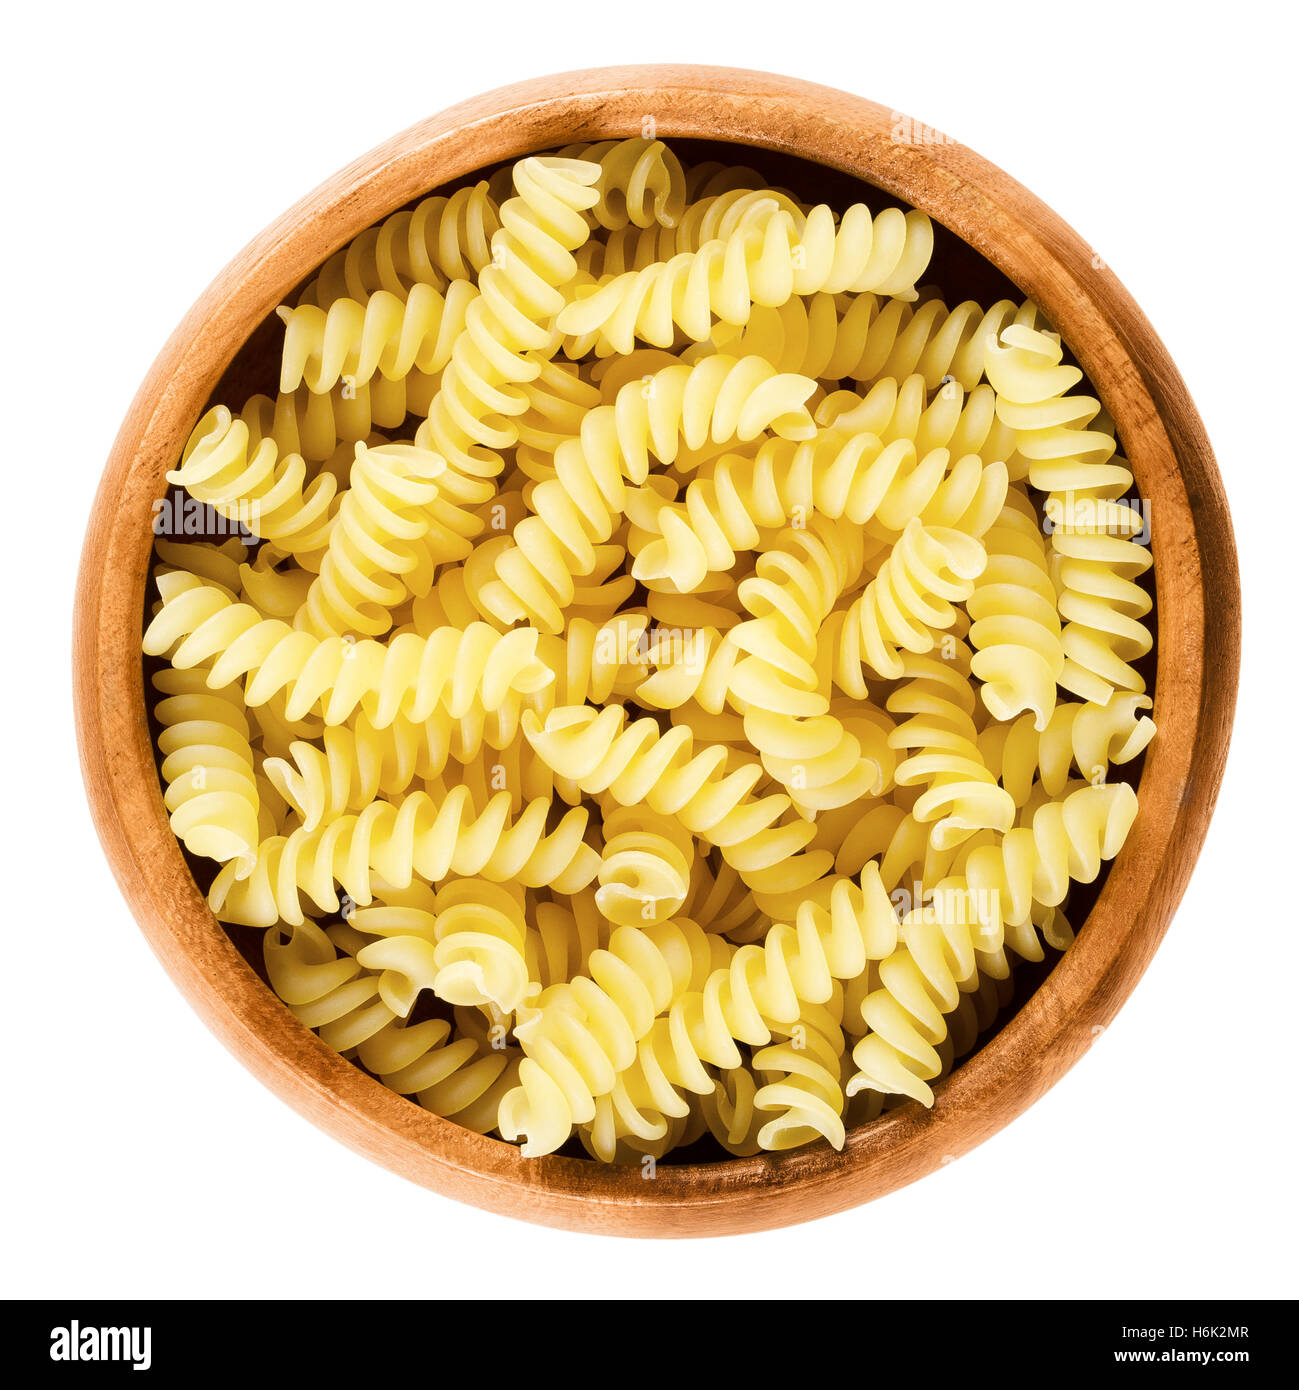 Girandole torsades pasta in wooden bowl. Uncooked dried durum wheat semolina pasta. Single S-shaped strand of noodles - Stock Image